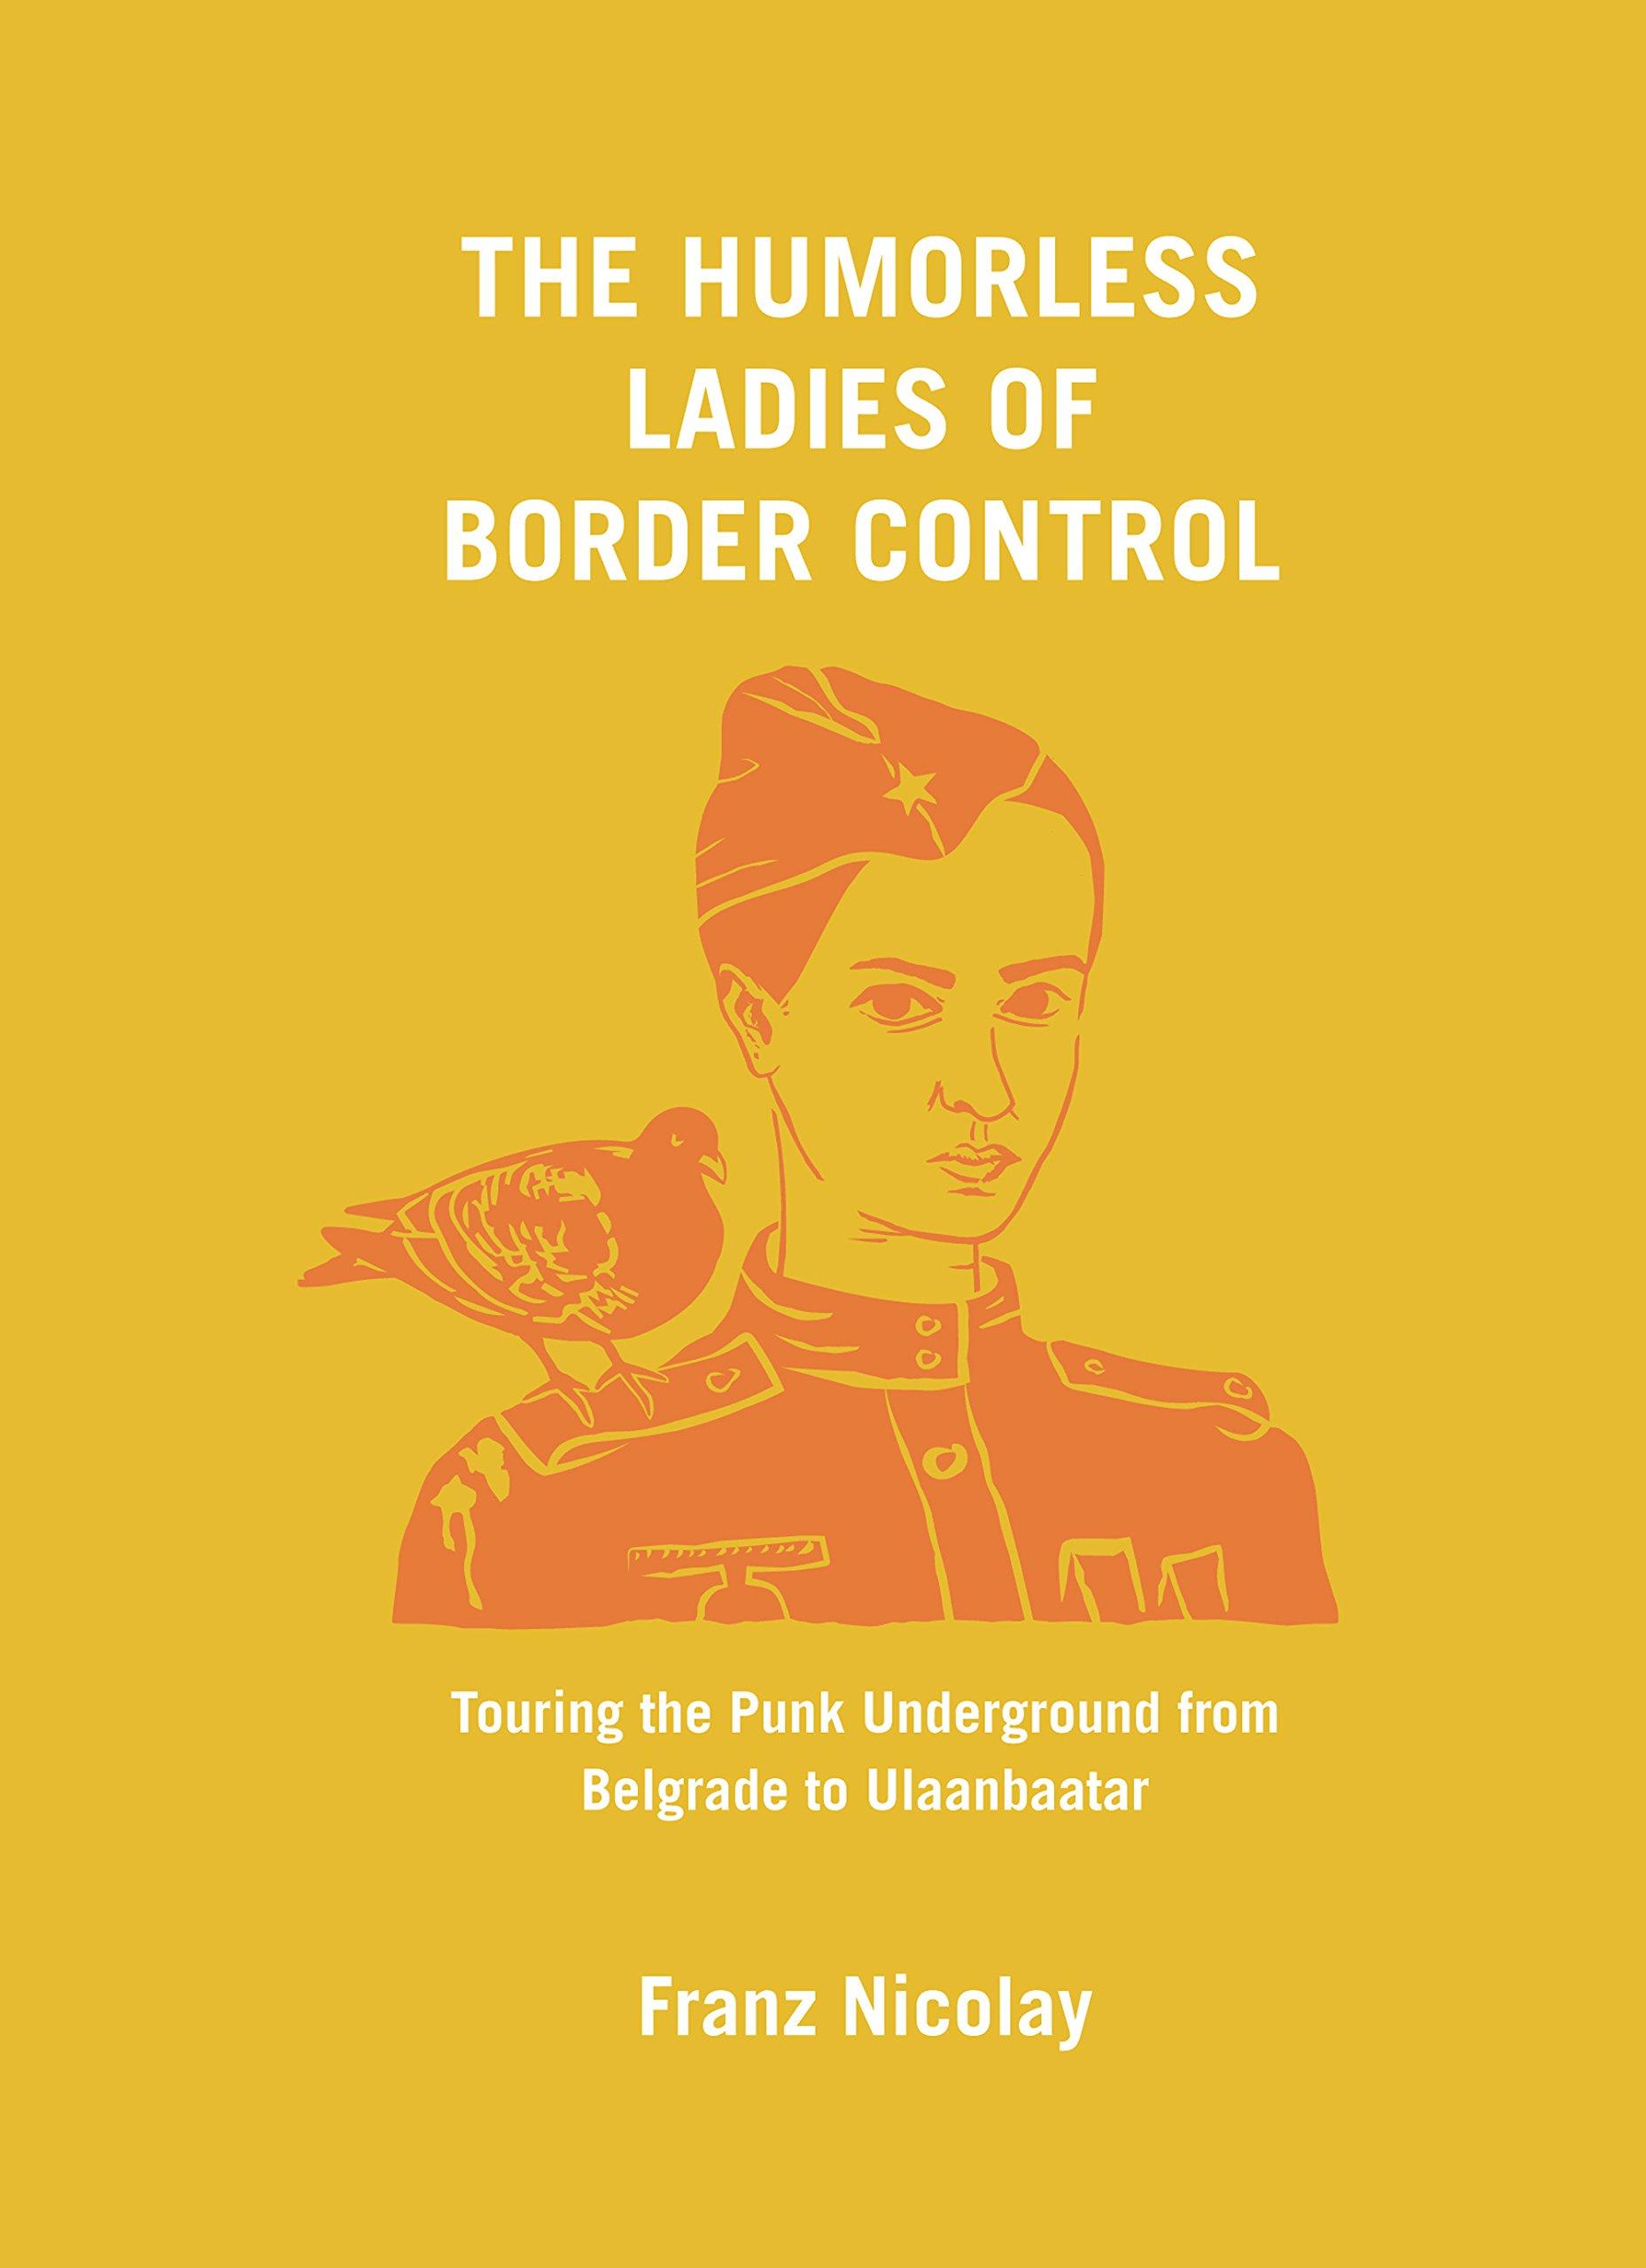 The Humorless Ladies of Border Control: Touring the Punk Underground from  Belgrade to Ulaanbaatar: Nicolay, Franz: 9781620971796: Amazon.com: Books